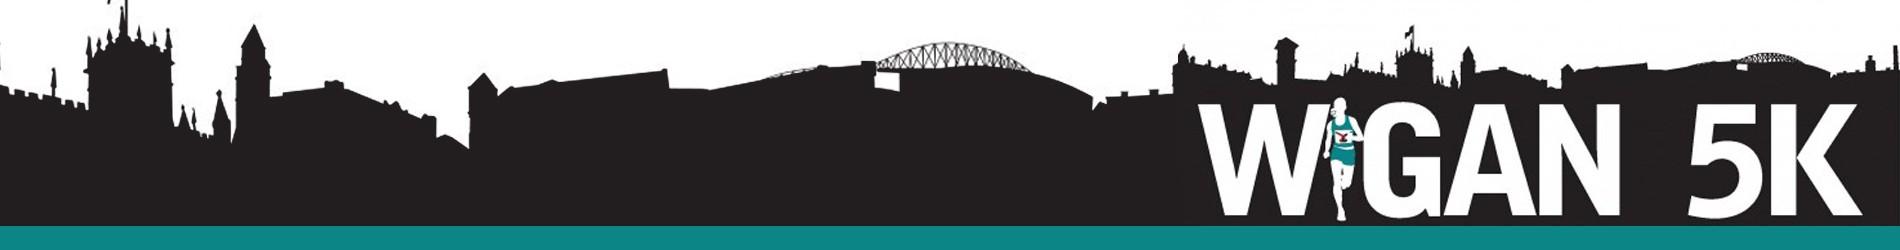 The Wigan 5k 2022